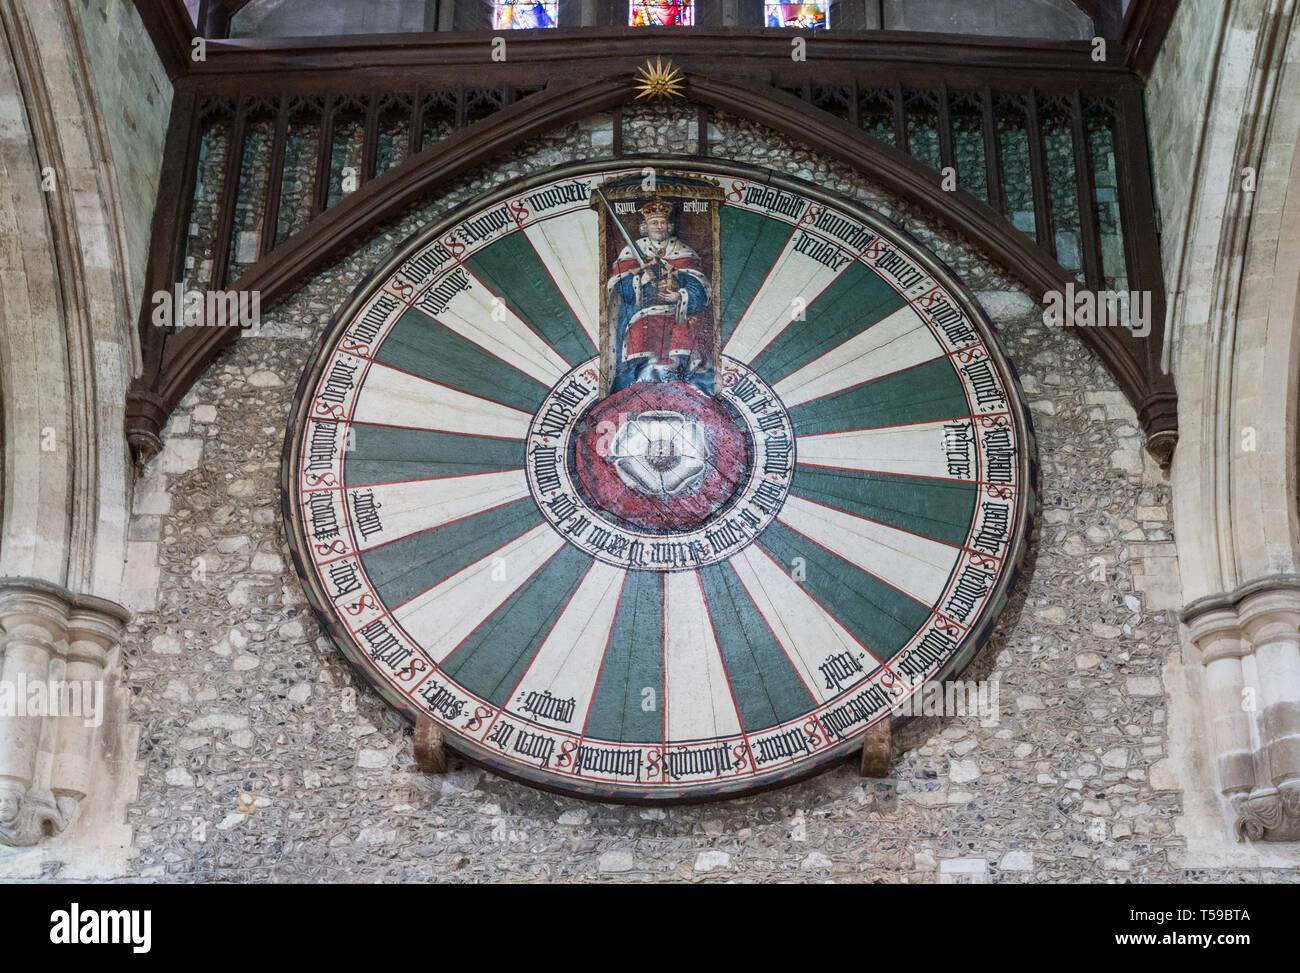 König Arthurs Tafelrunde in der Großen Halle, Winchester, Hampshire, UK Stockbild